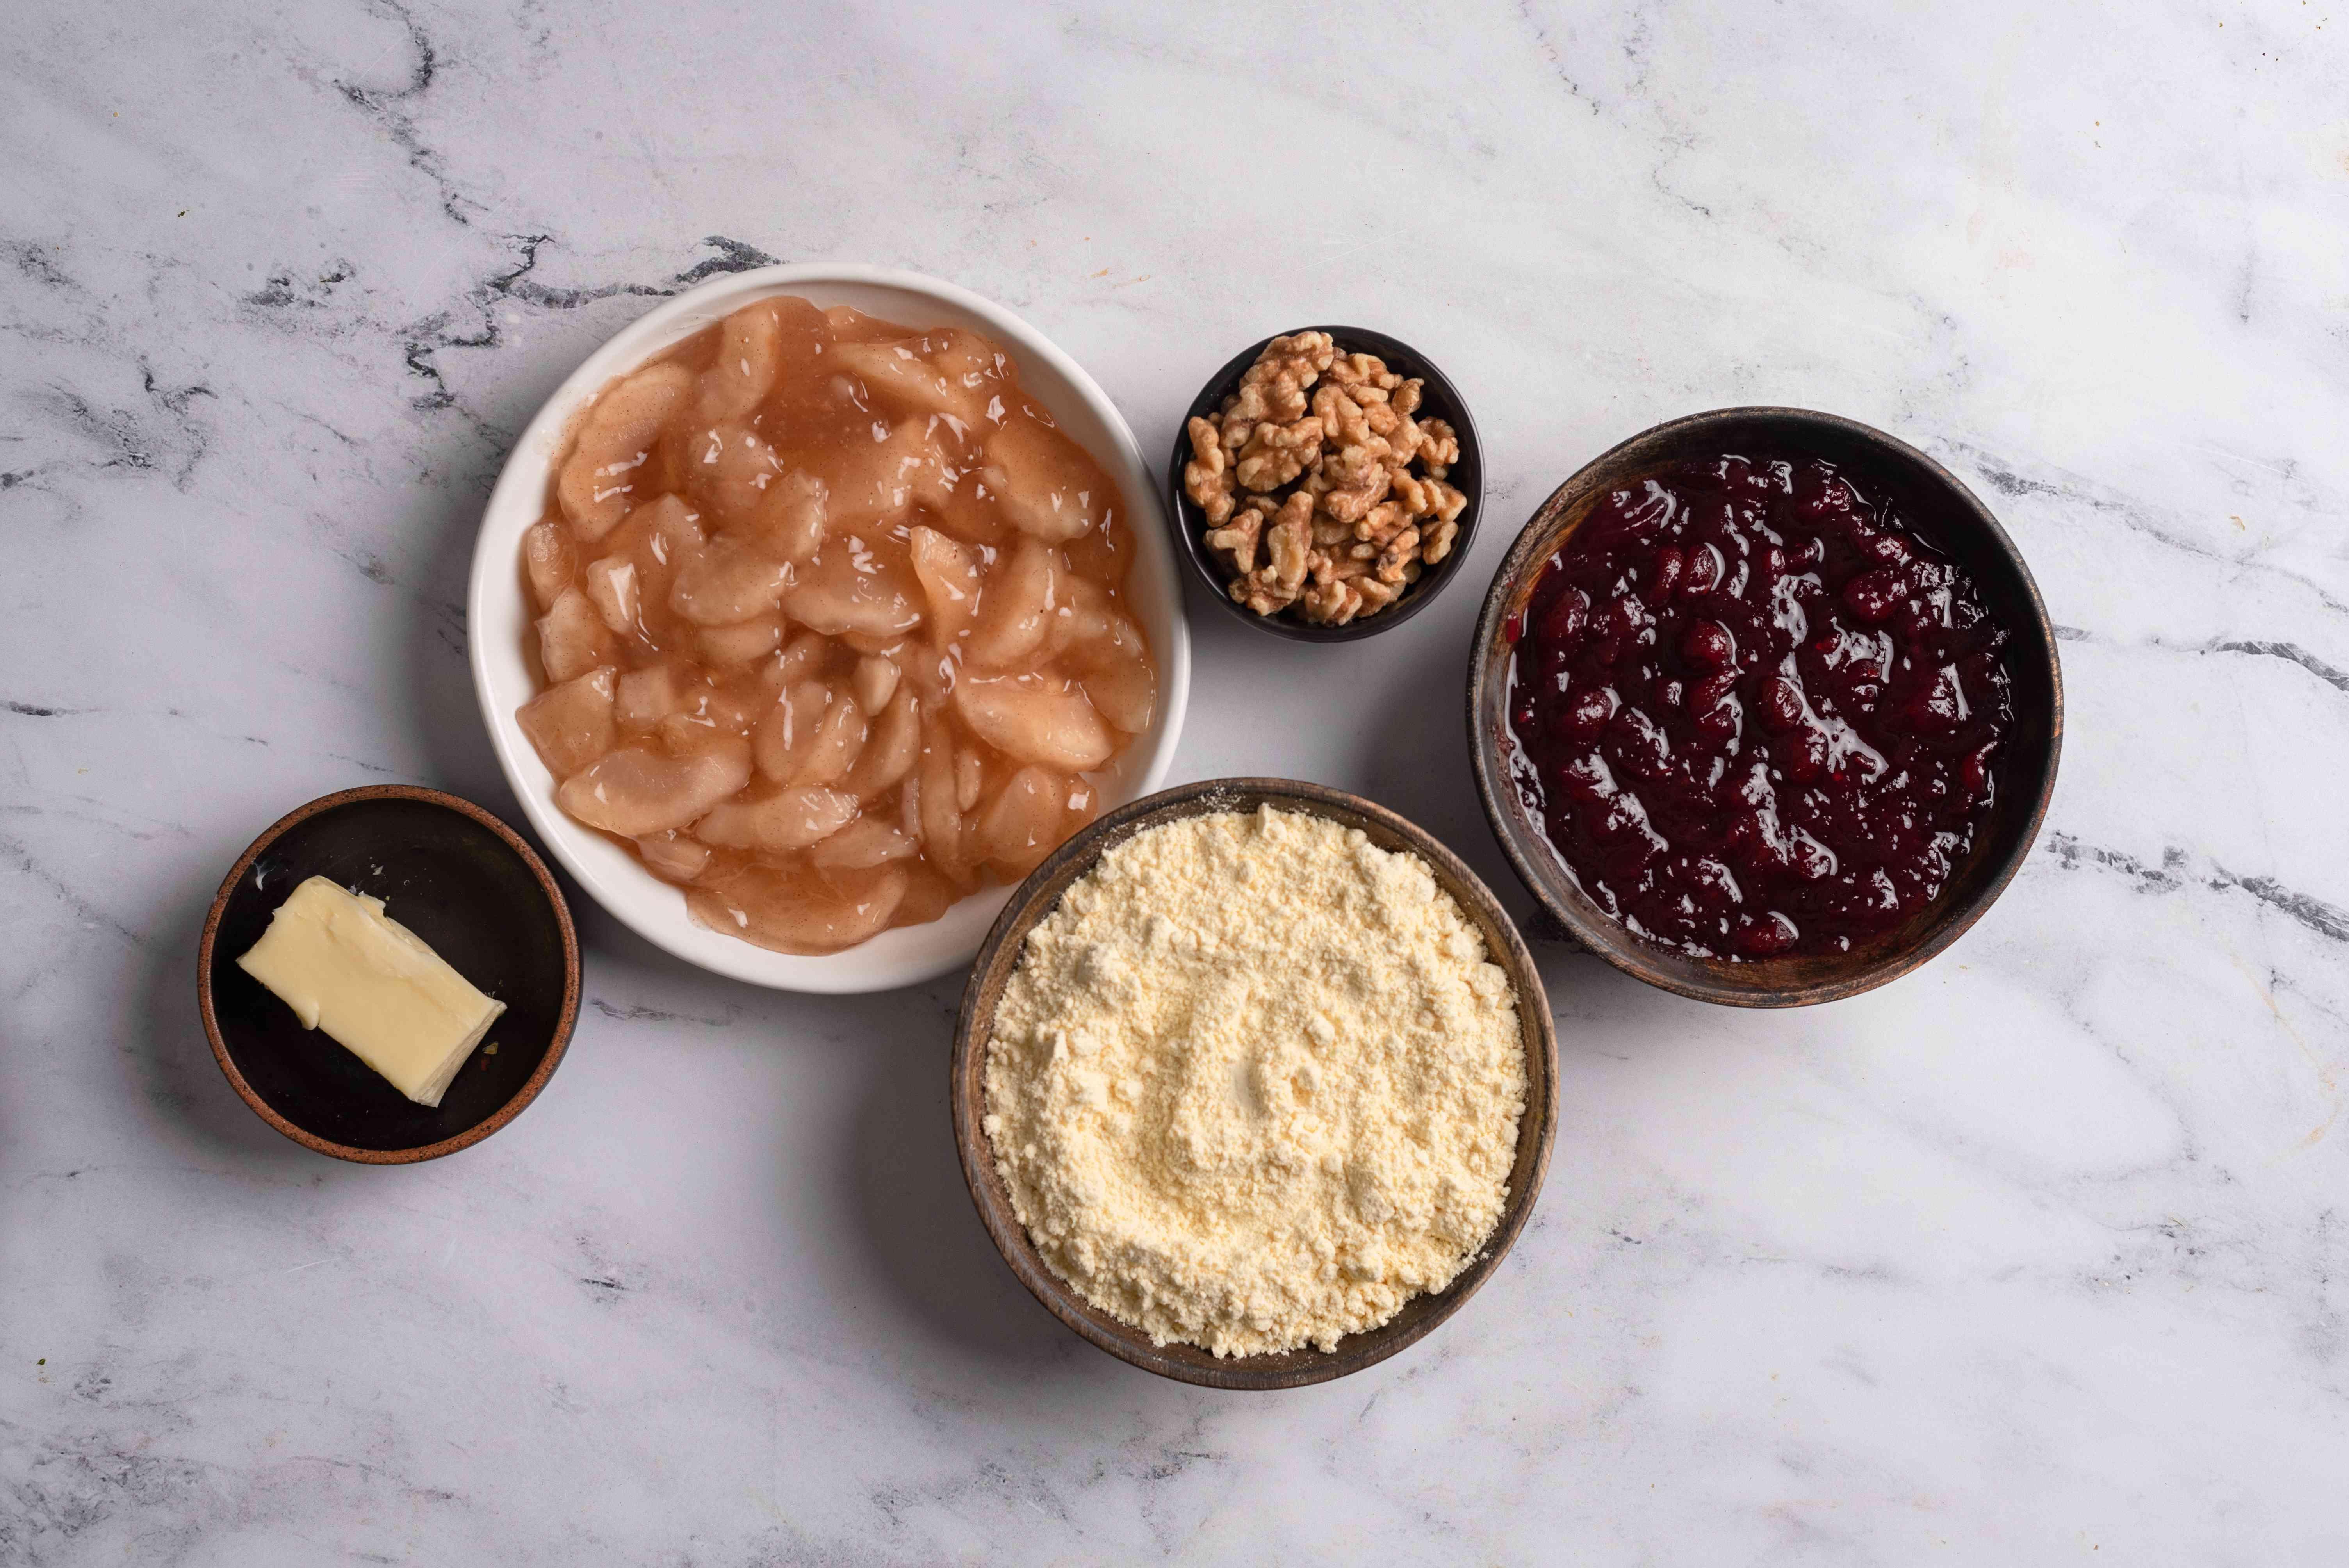 Christmas Dump Cake ingredients